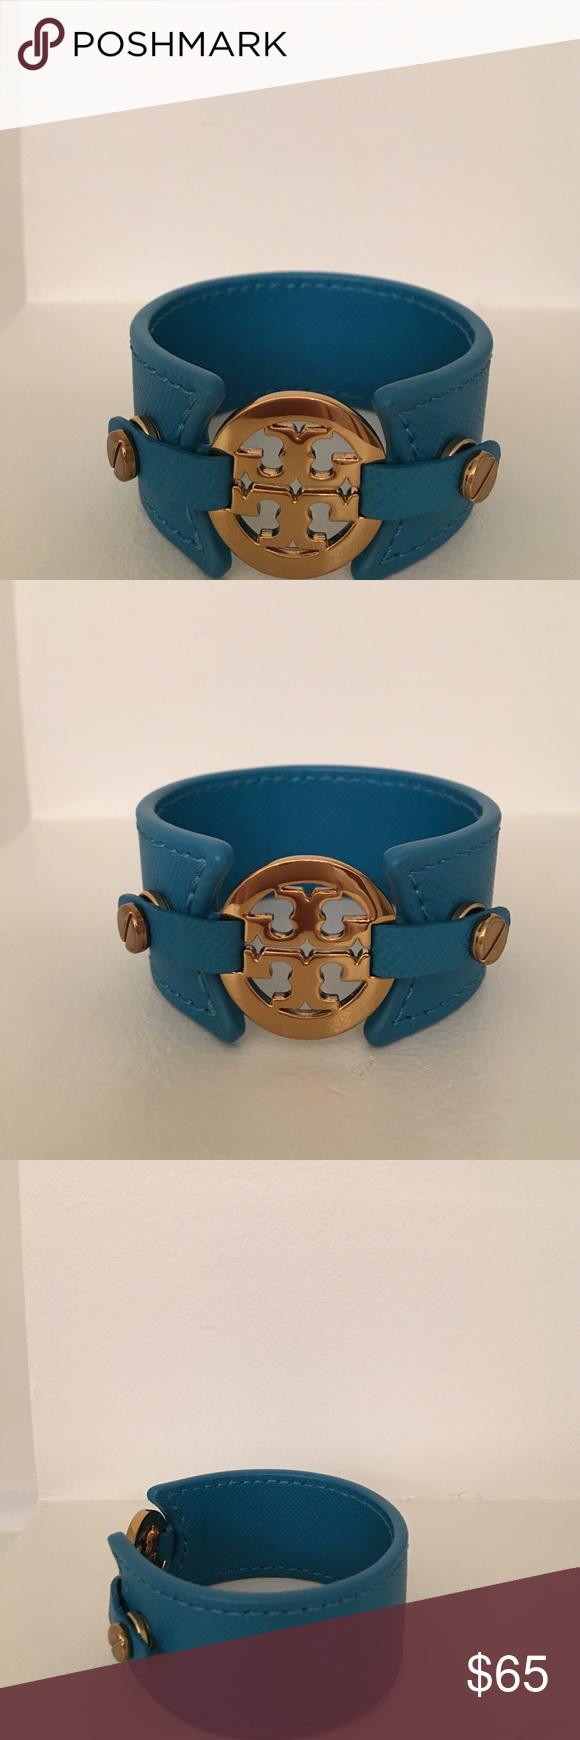 Tory Burch leather cuff NEW! Tory Burch blue leather cuff! New and flawless never worn! Tory Burch Jewelry Bracelets